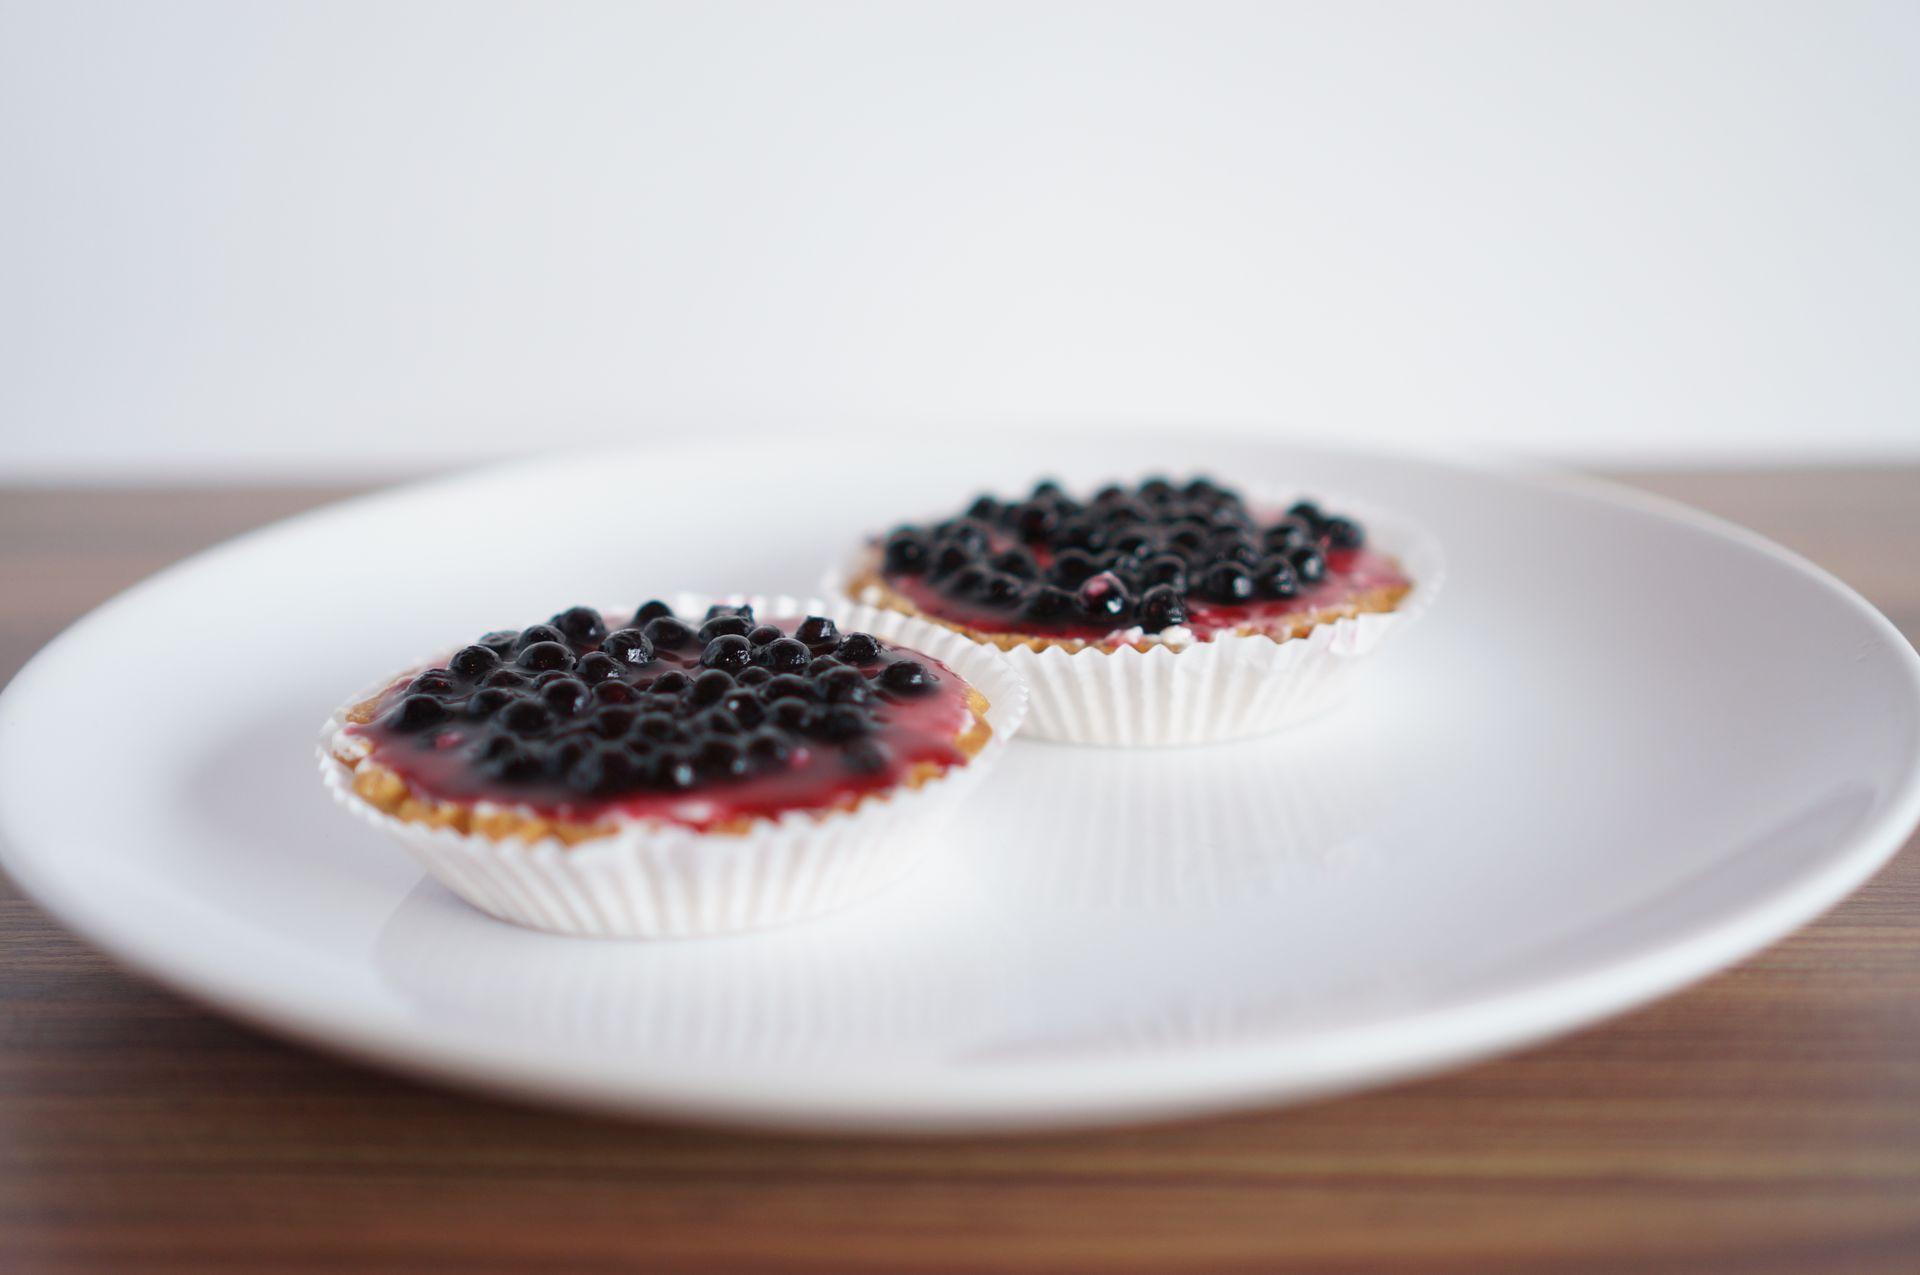 Tartaletės (varškės kremo su mėlynėmis)